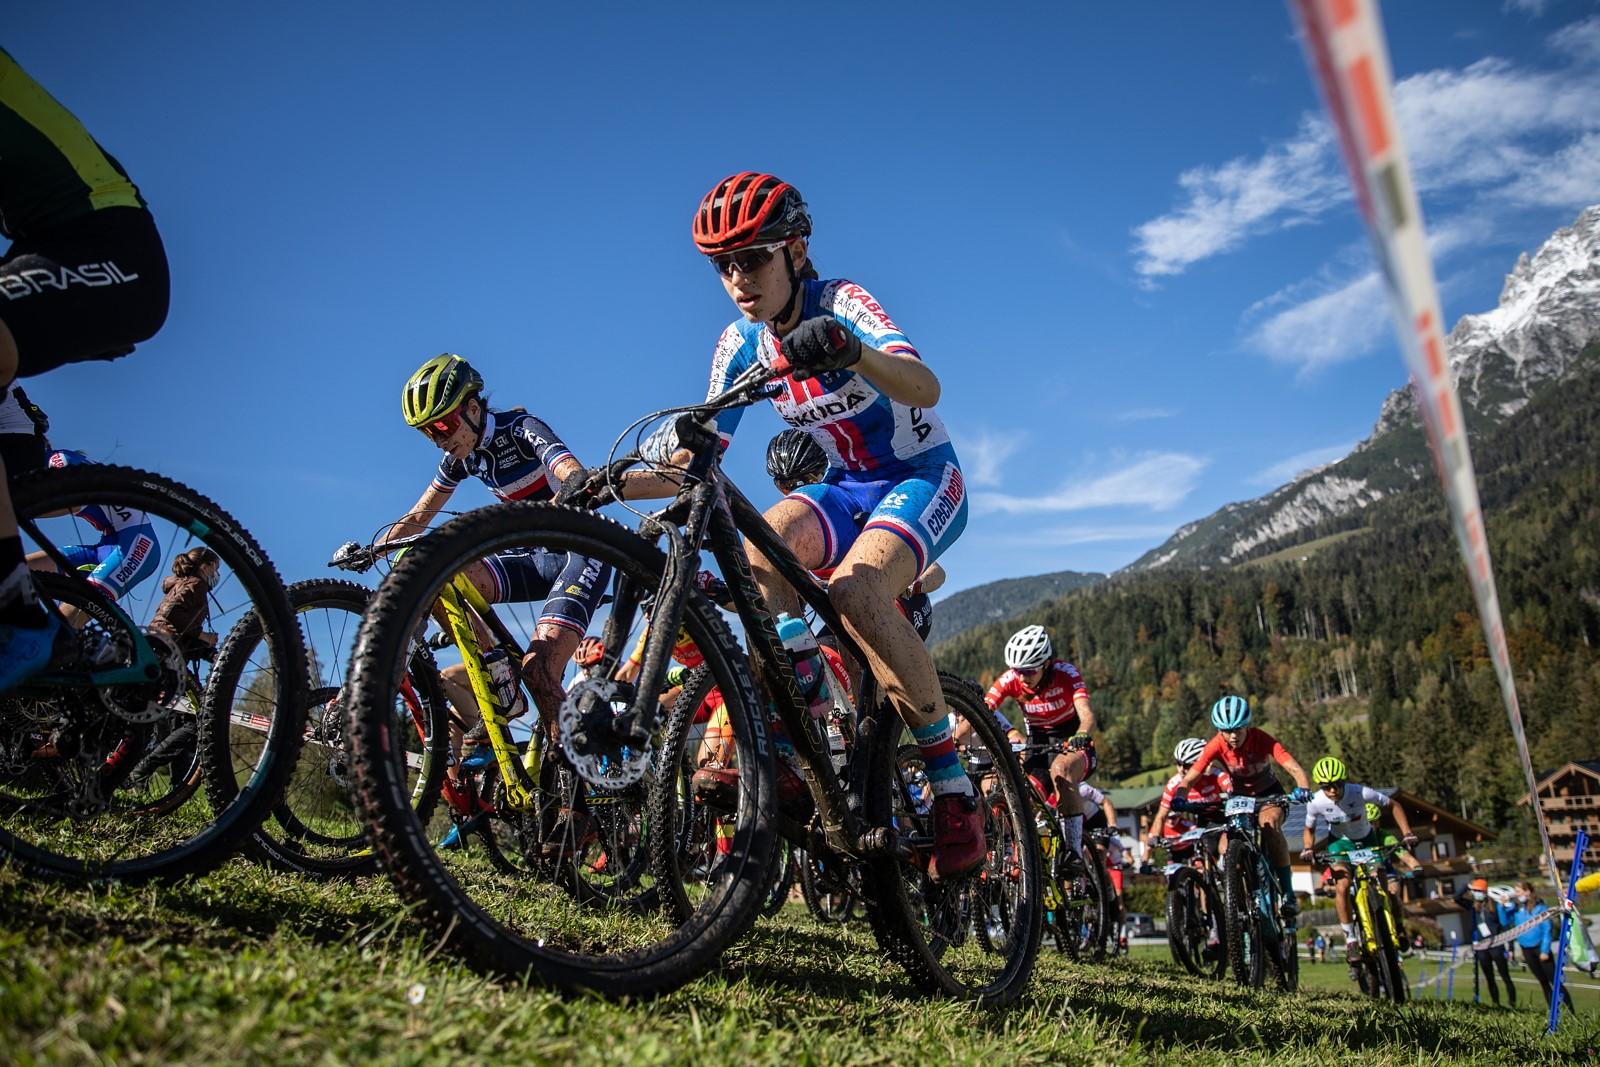 Aneta Novotná na trati mistrovství světa horských kol 2020 v rakouském Leogangu. Foto: Michal Červený